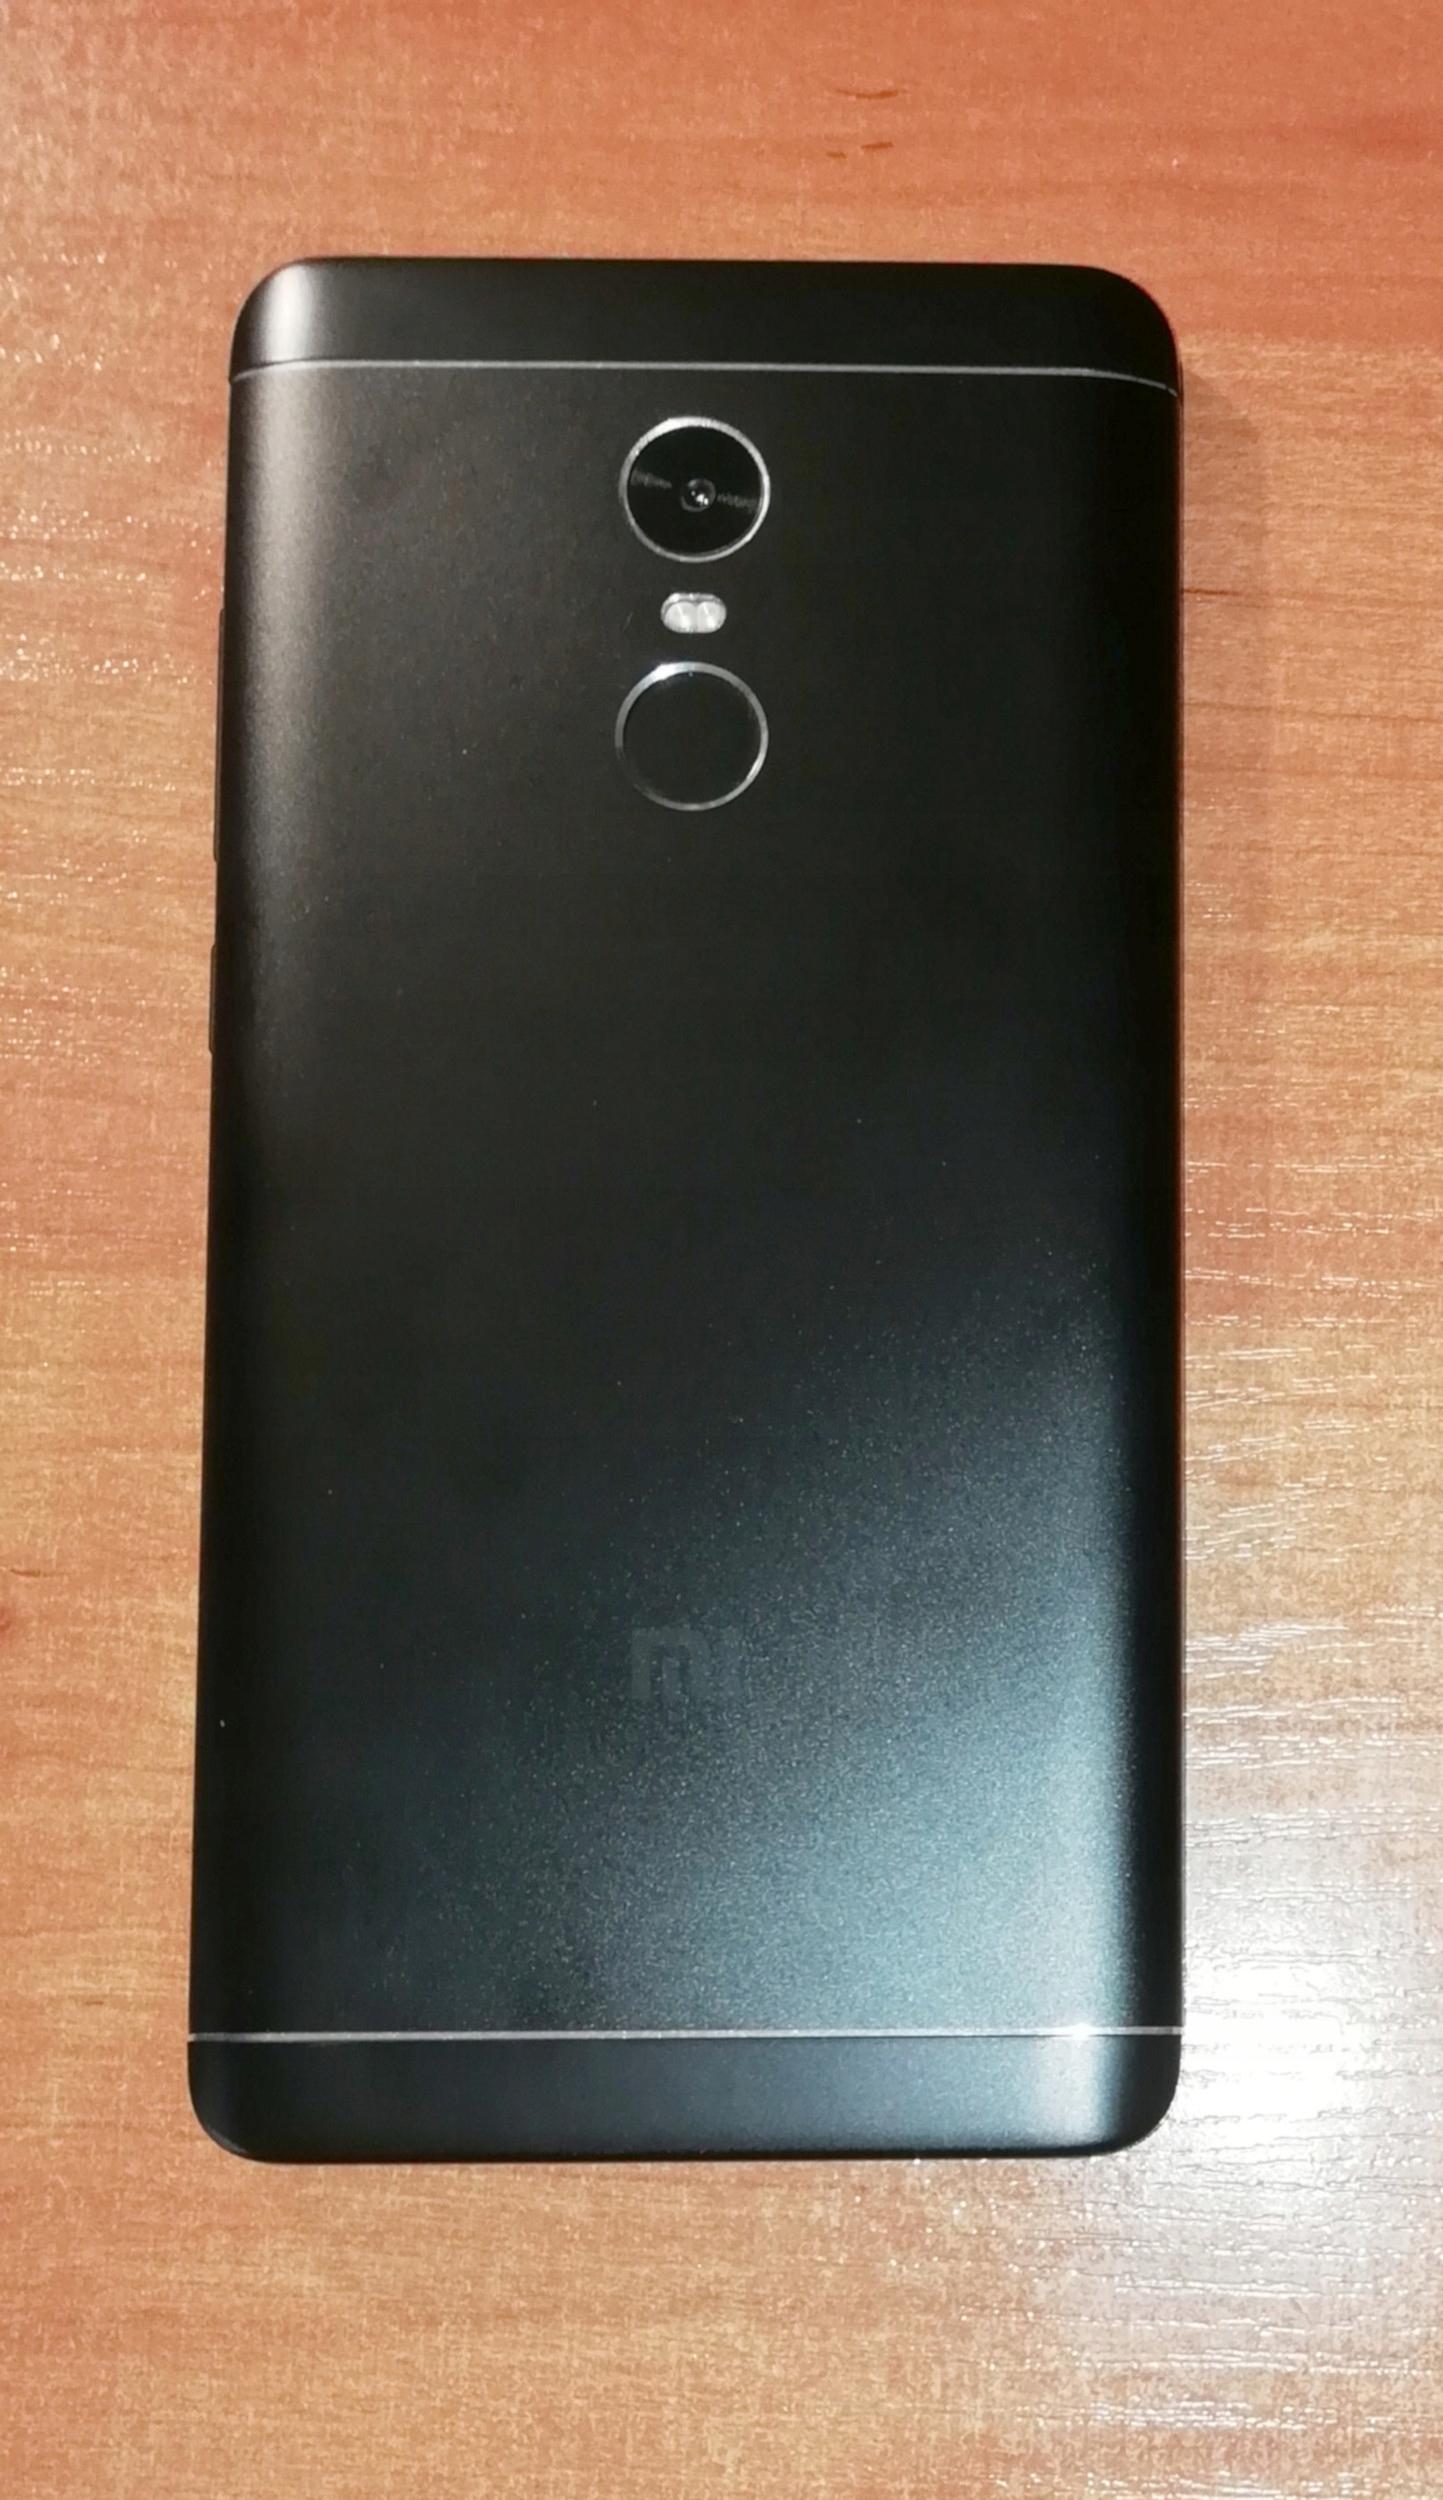 Xiaomi Redmi Note 4x 4 64gb Global B20 Snap 625 7452401220 64